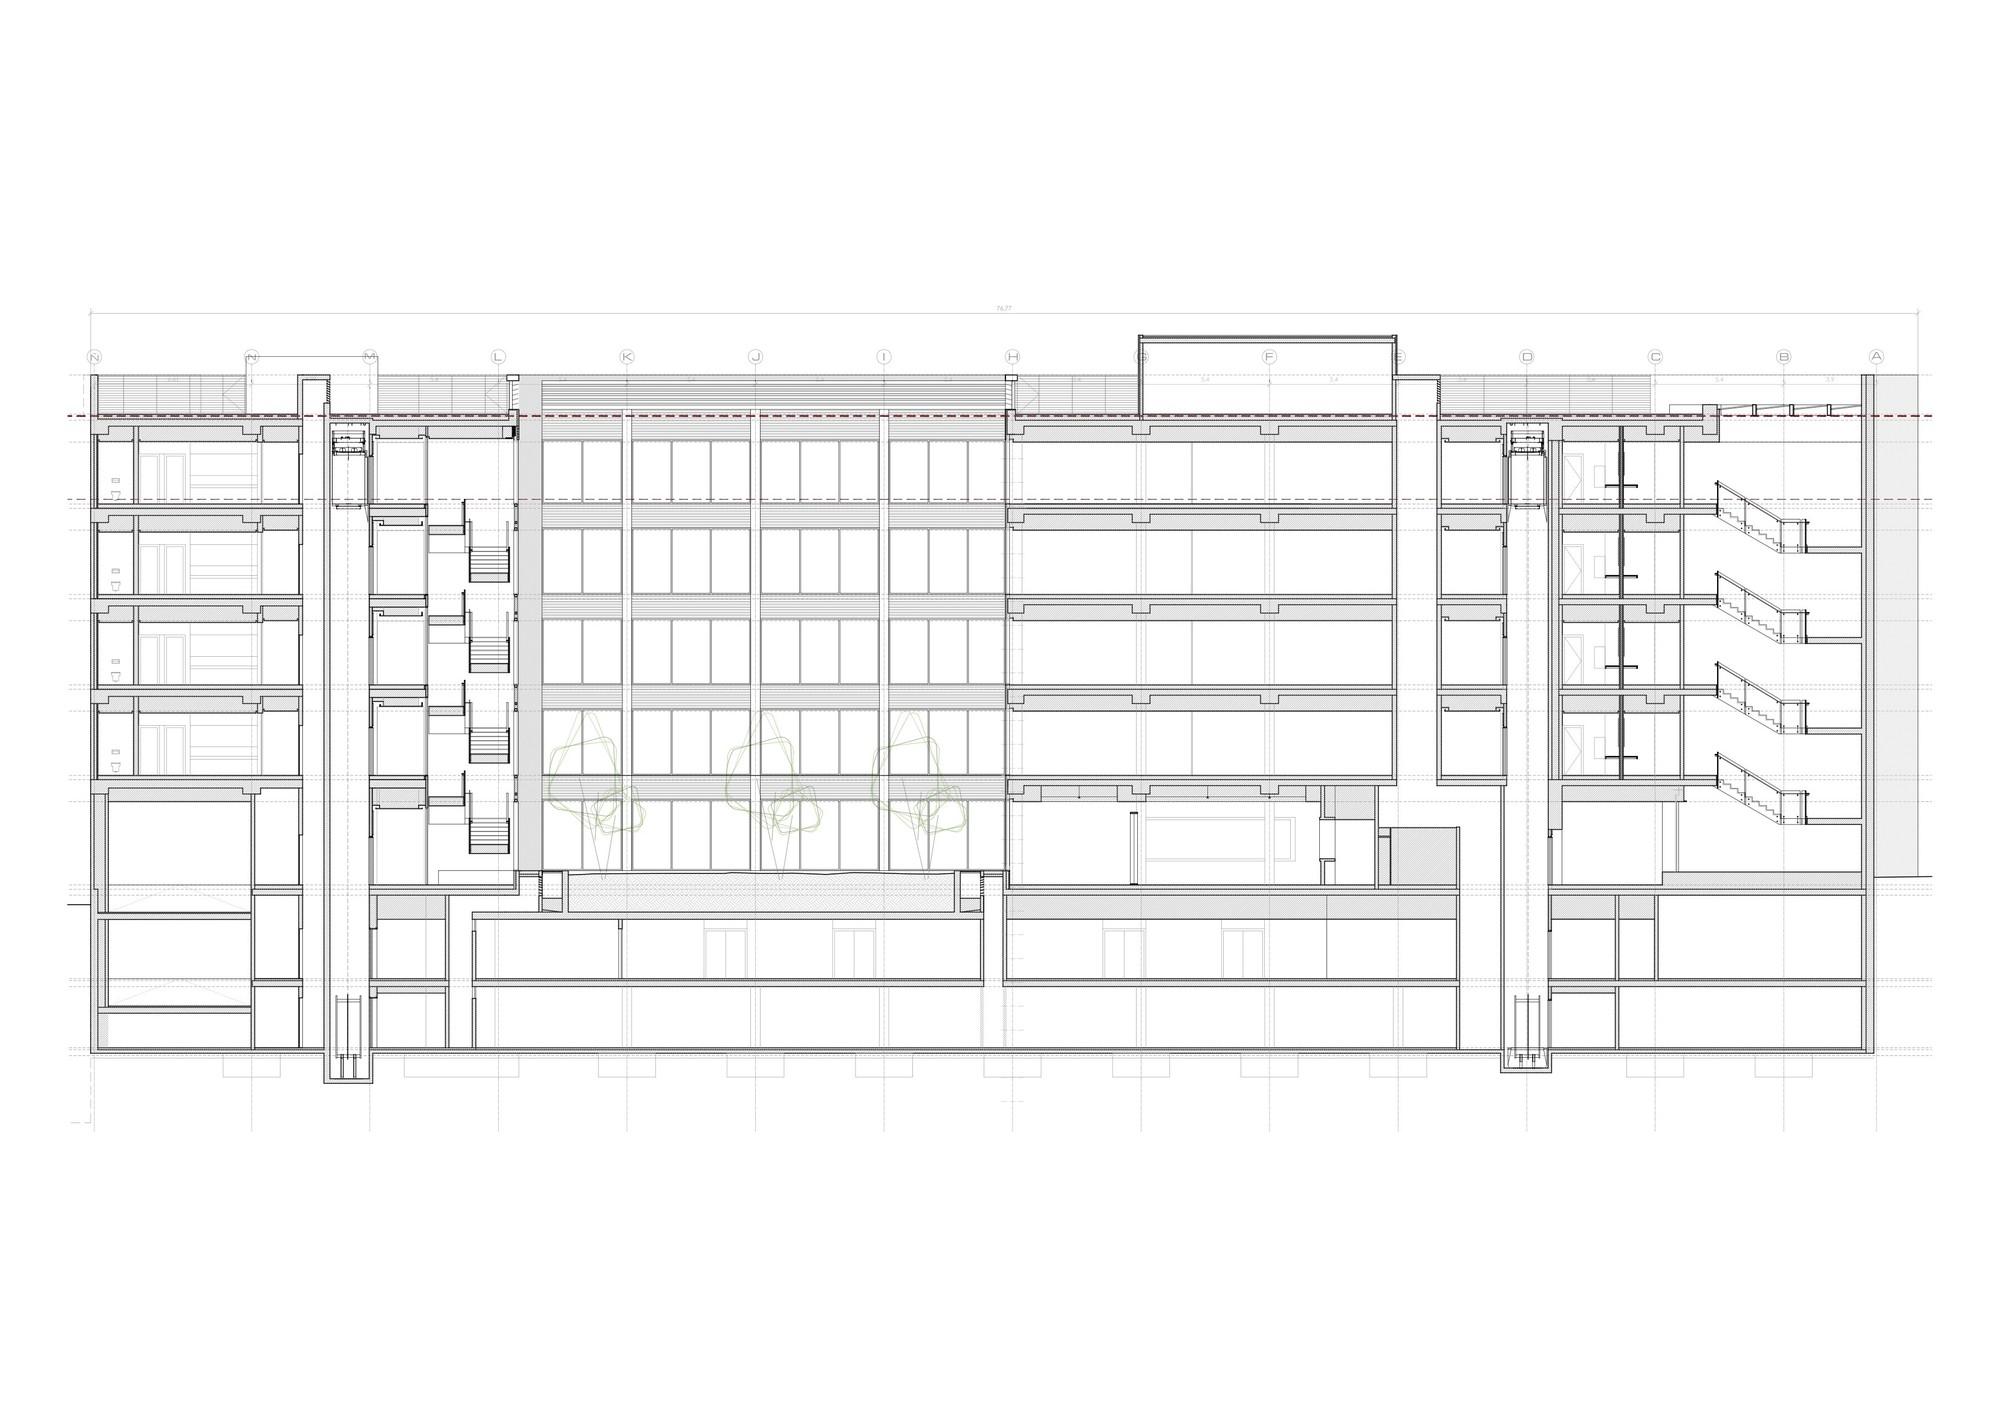 Galer a de edificio de oficinas en vitoria lh14 arquitectos 17 - Arquitectos en vitoria ...